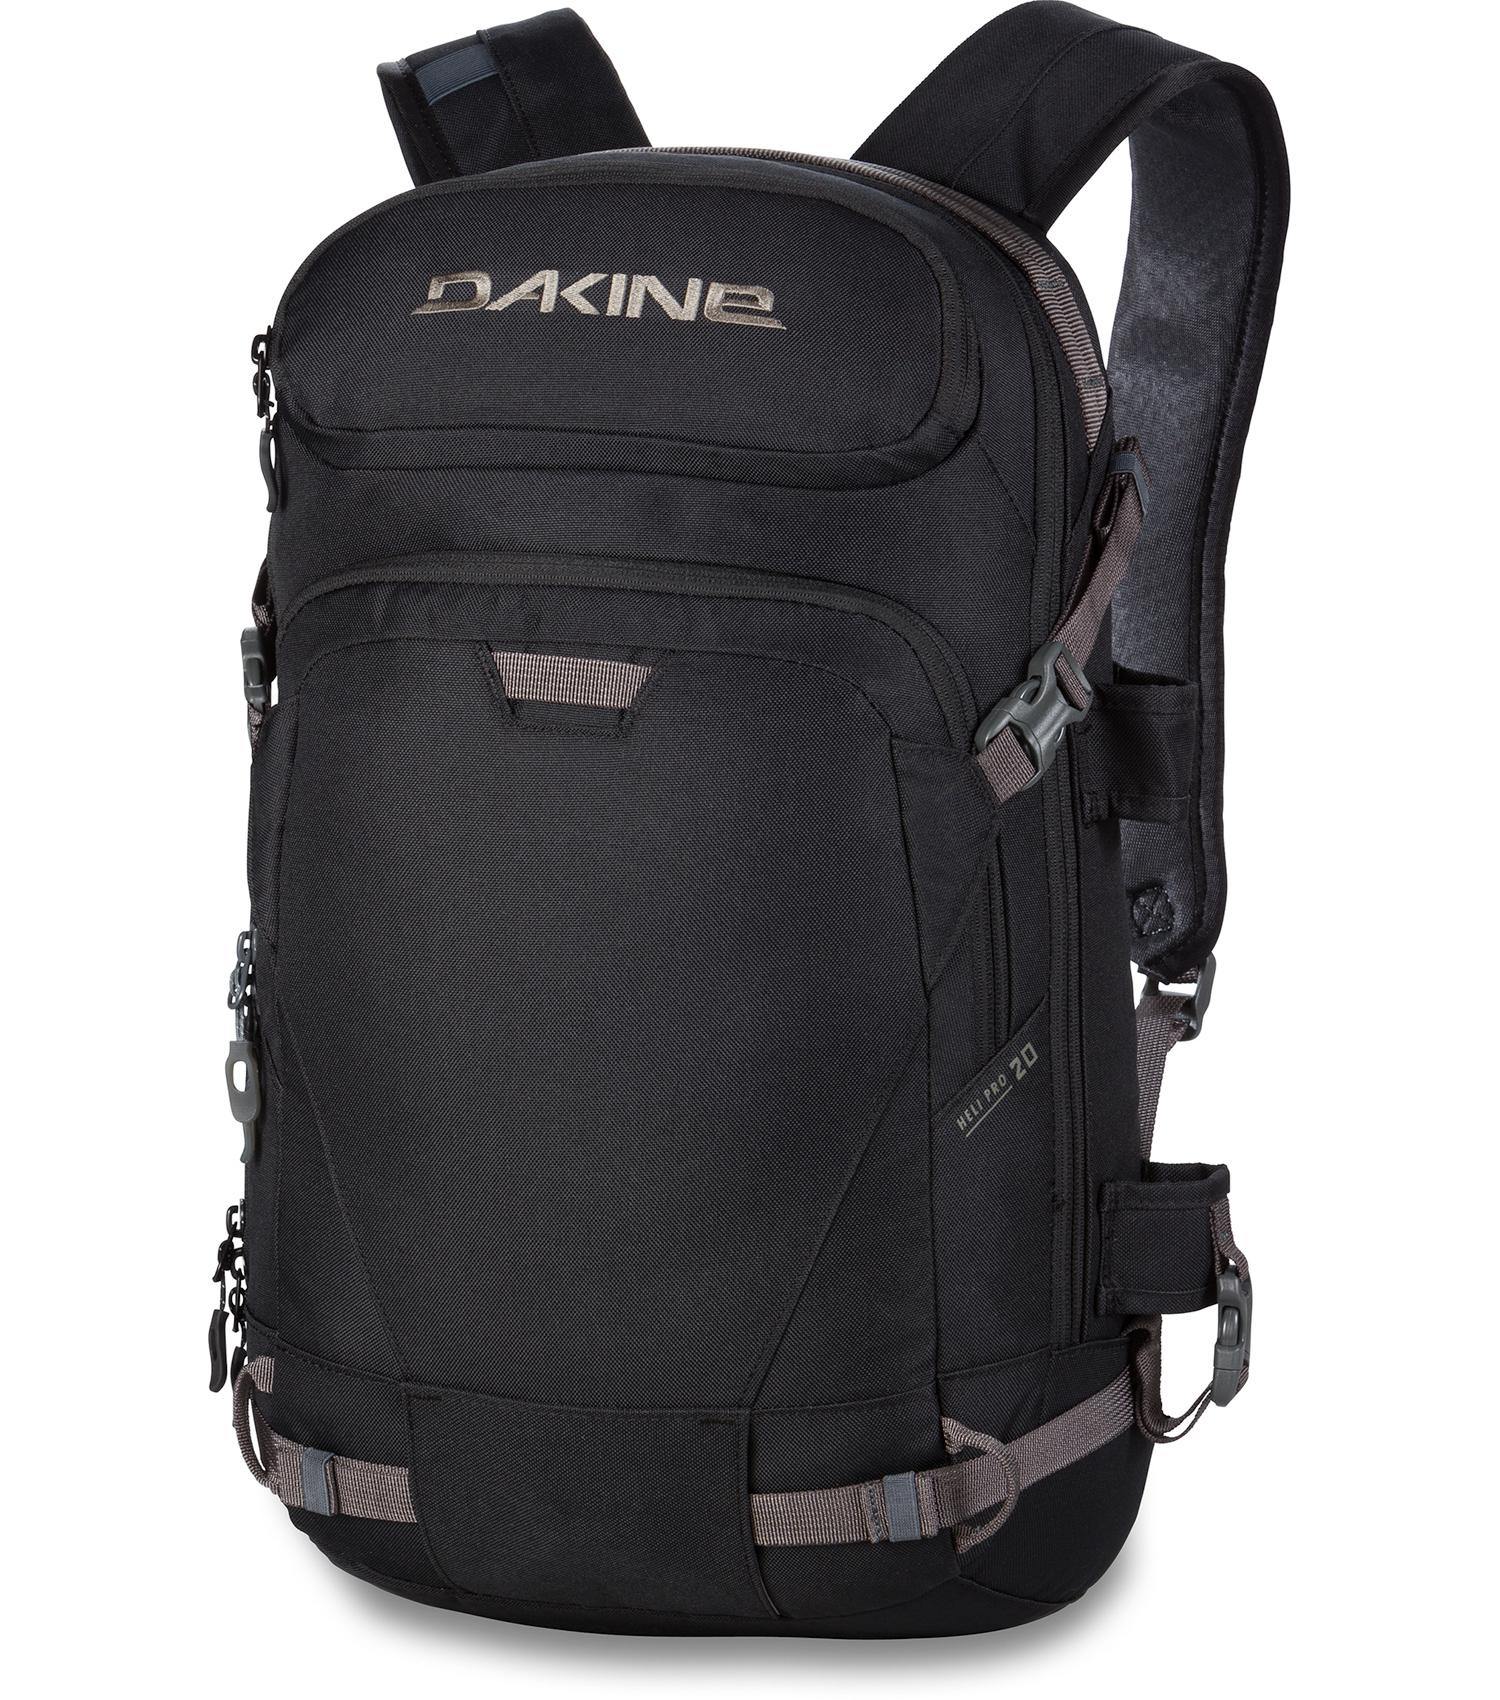 Dakine Backpack - Heli Pro 20L - Snowboard, Ski, Rucksack, Snow ...